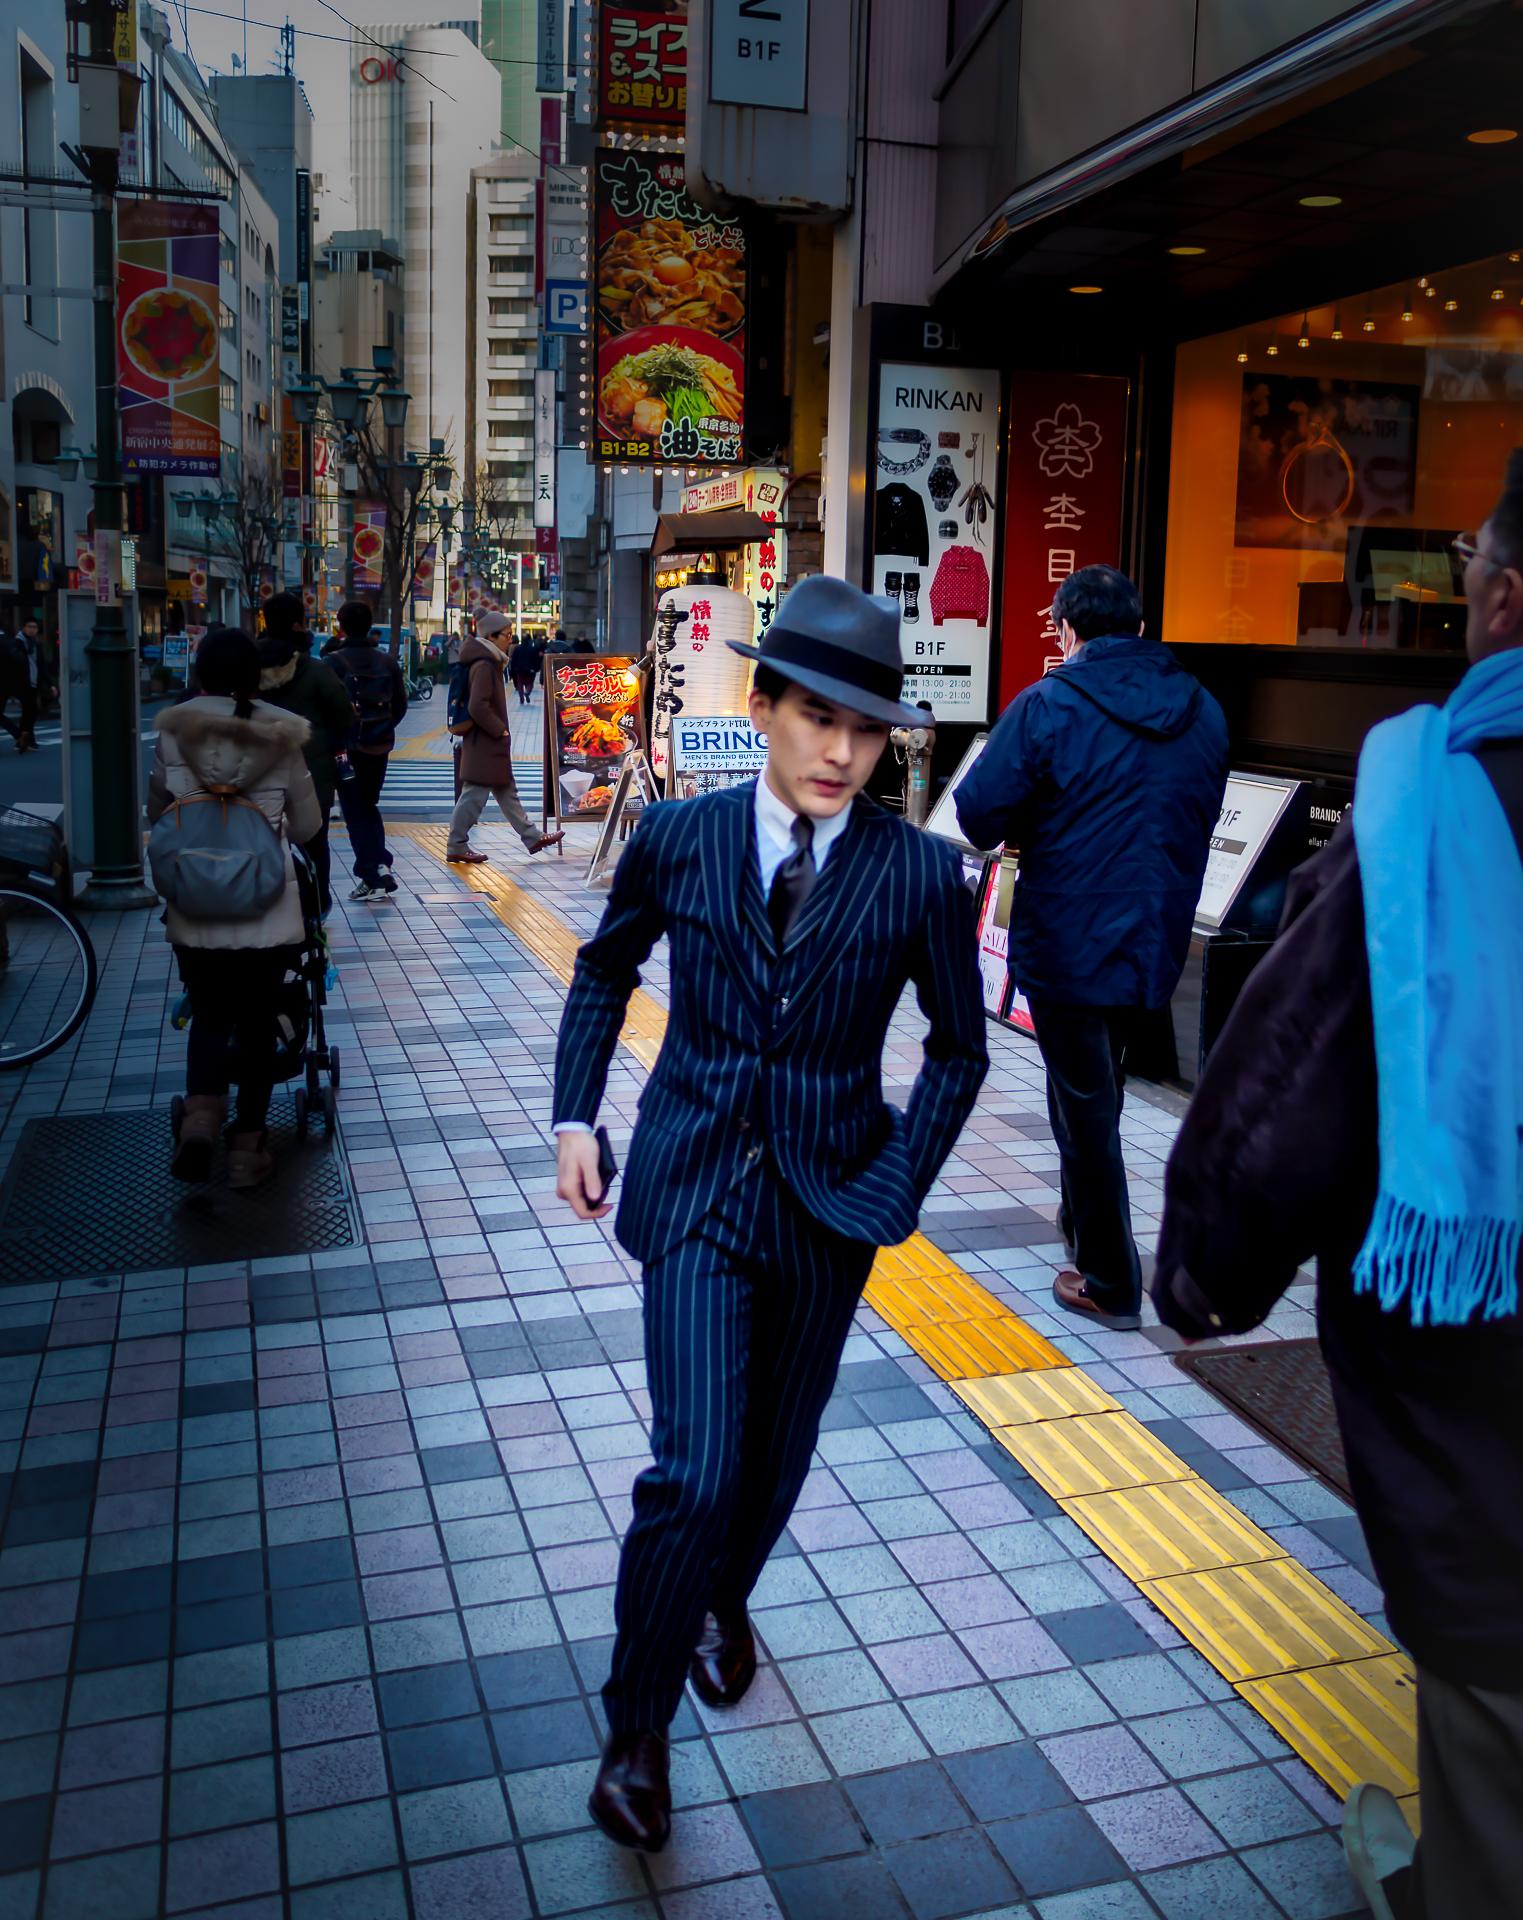 2018 .... A new Gangster in Shinjuku...